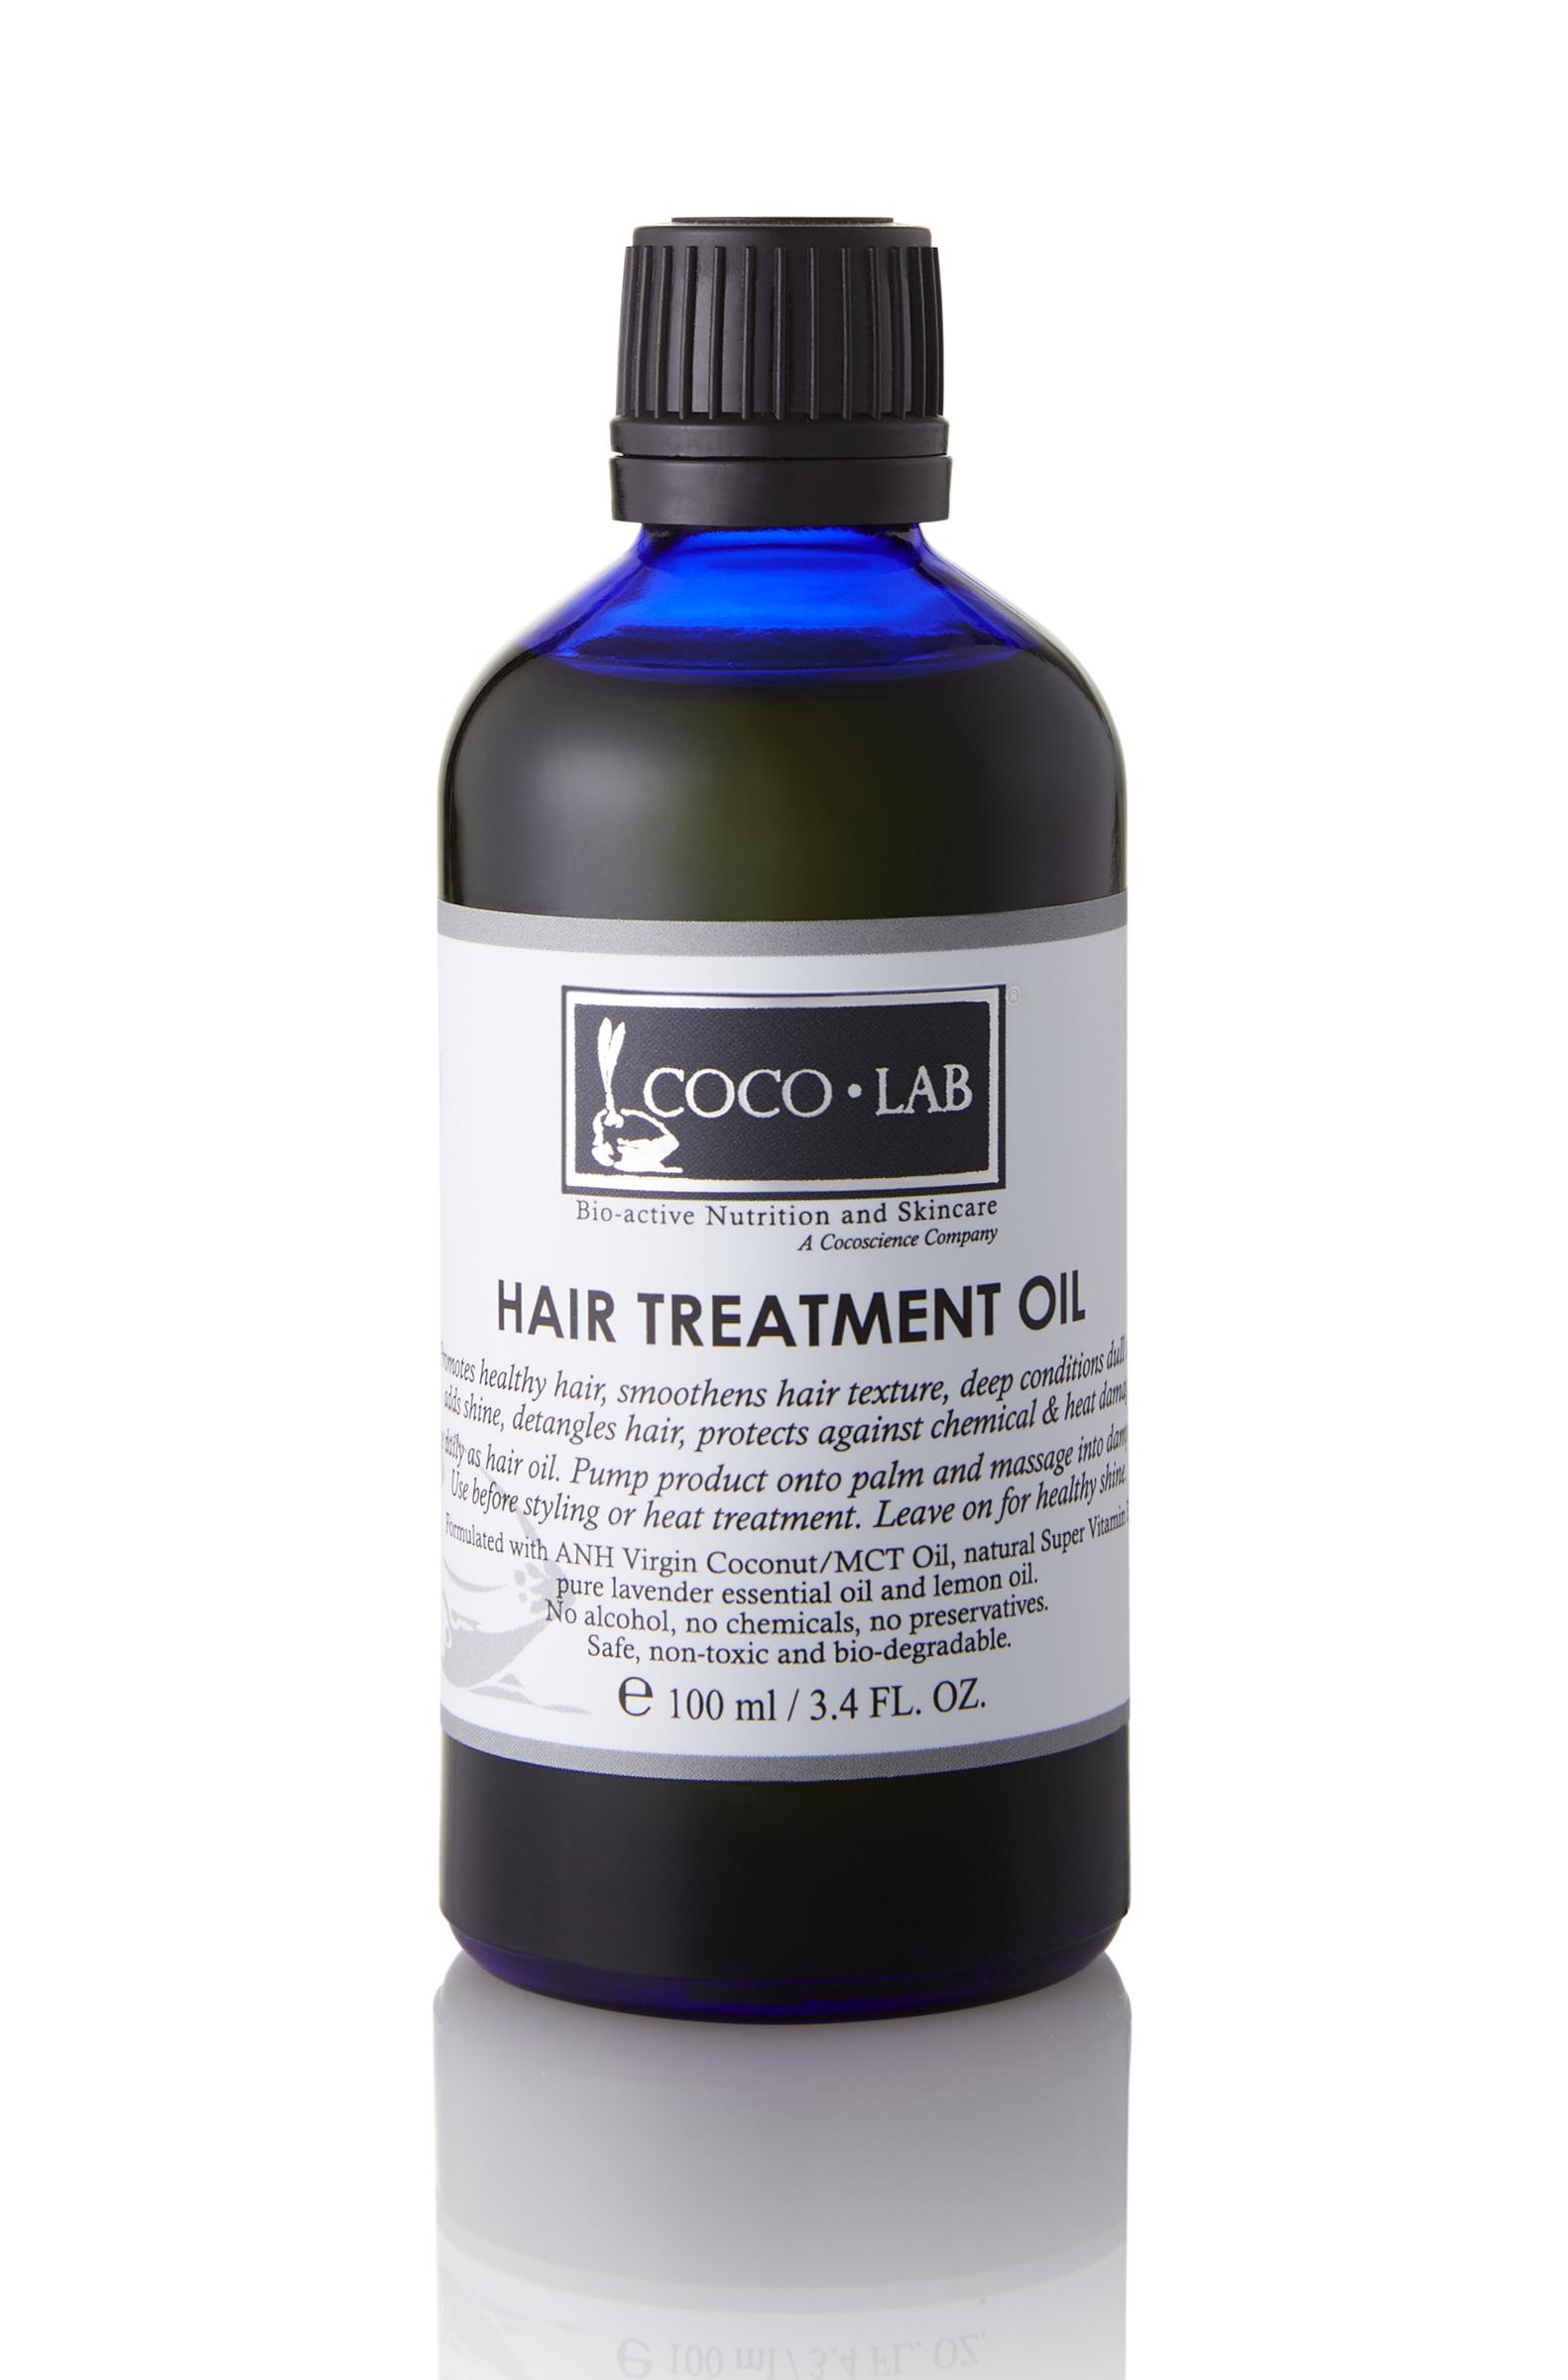 HAIR TREATMENT OIL 100 NEW - NEW.jpg